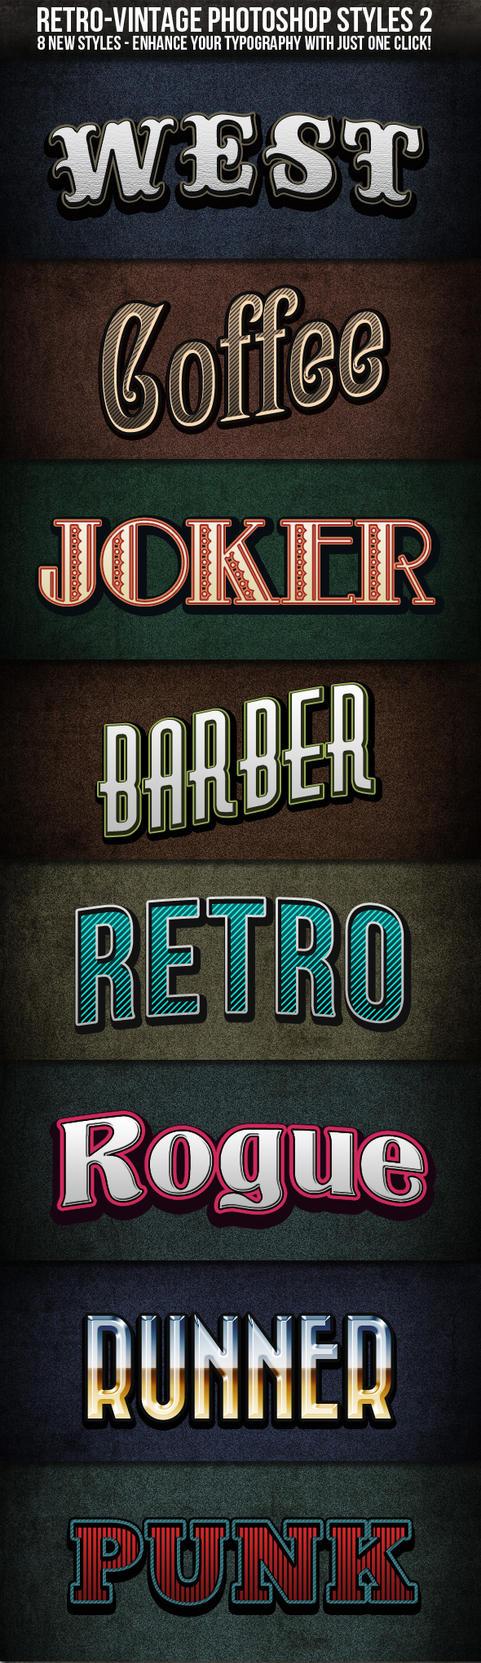 Retro-Vintage Text Styles 2 by nexion218